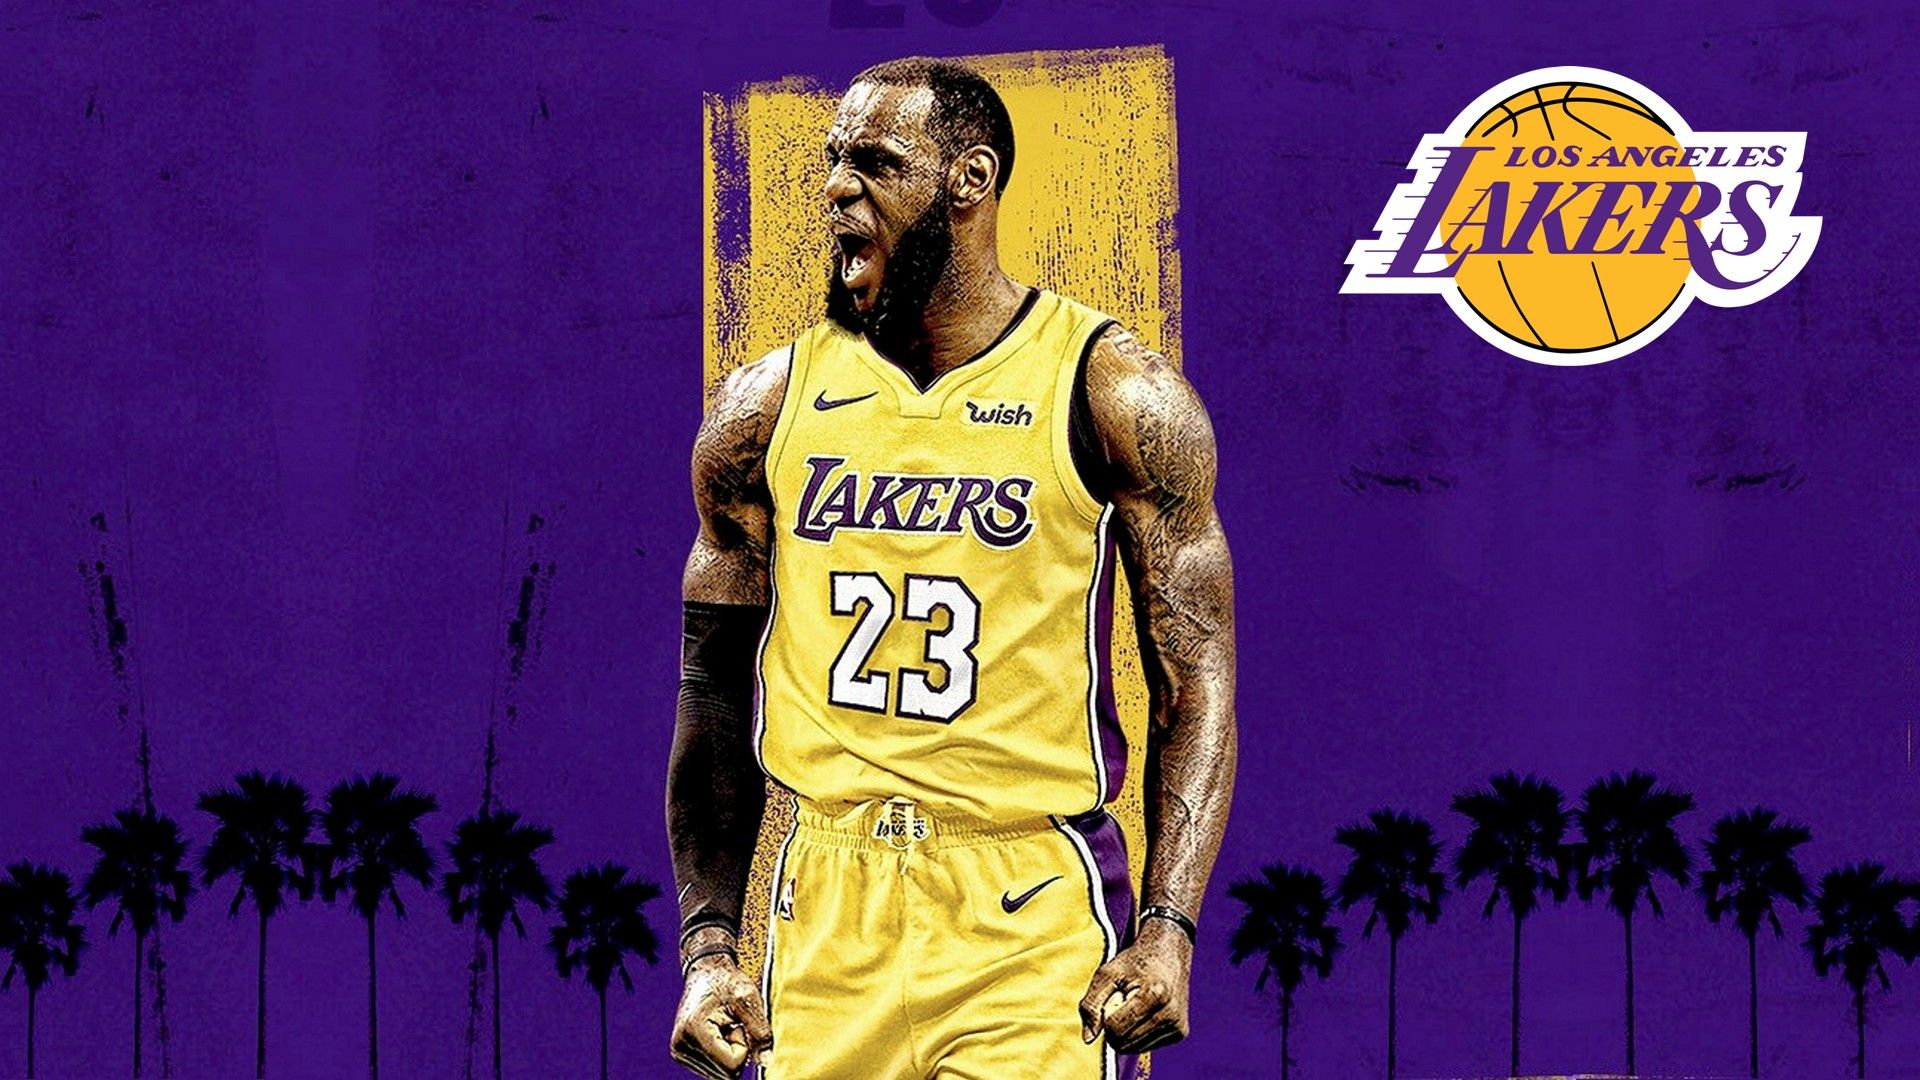 Lebron James Lakers Desktop Wallpapers In 2020 Lebron James Lakers Lebron James Wallpapers Lebron James